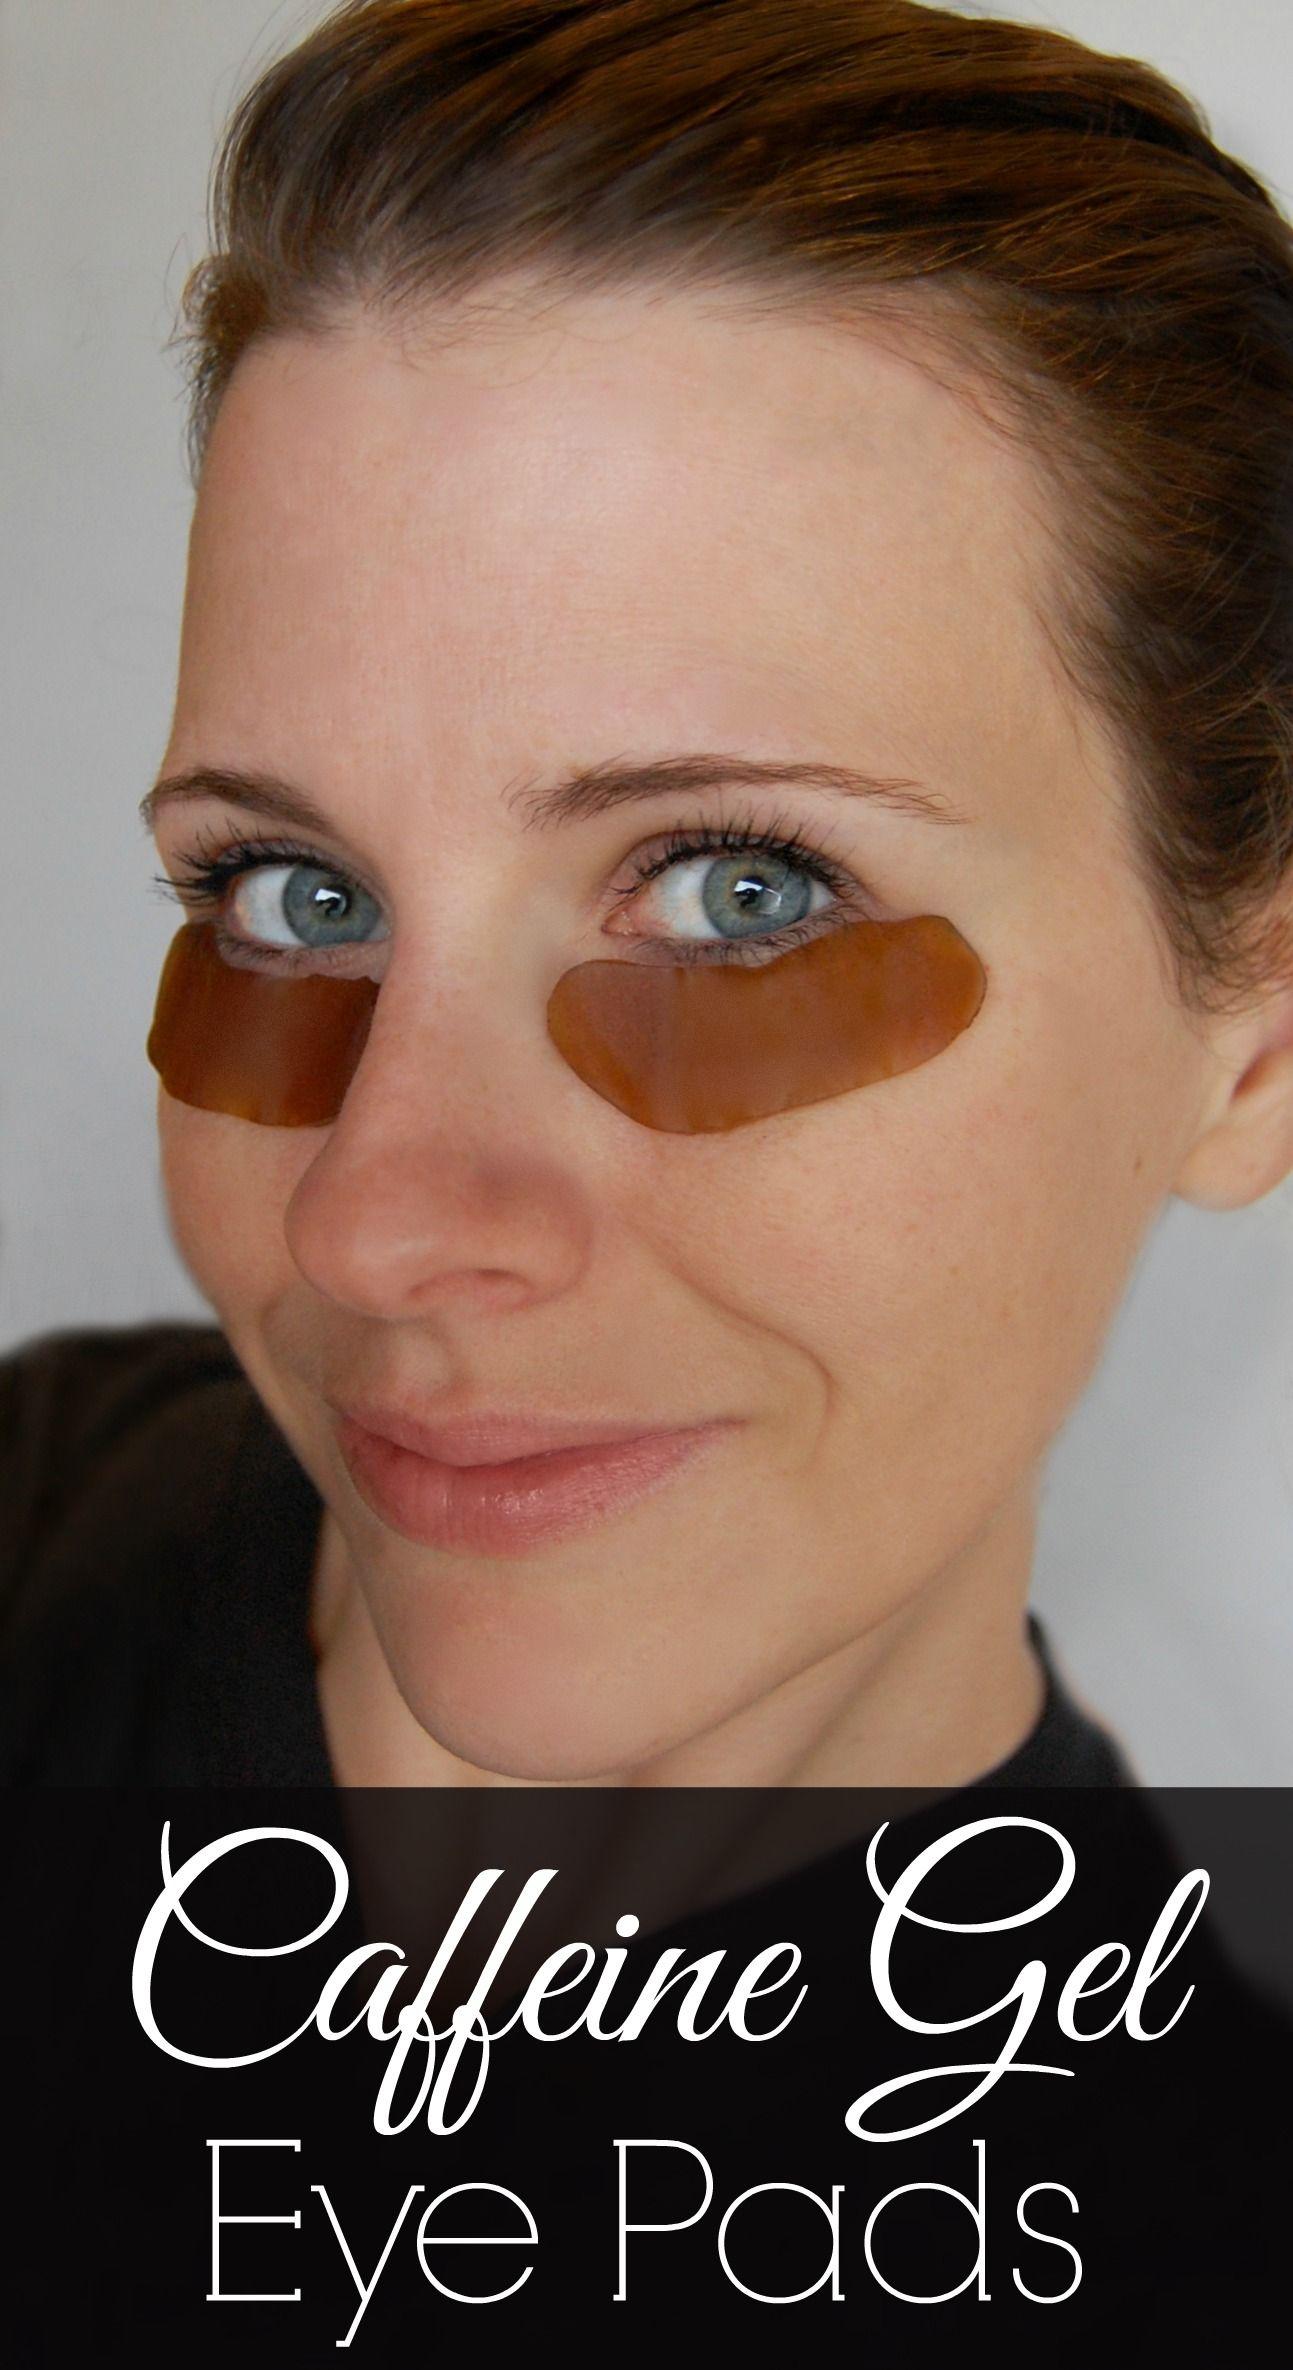 Caffeine Gel Eye Pads Puffy eyes, Beauty care, Reduce